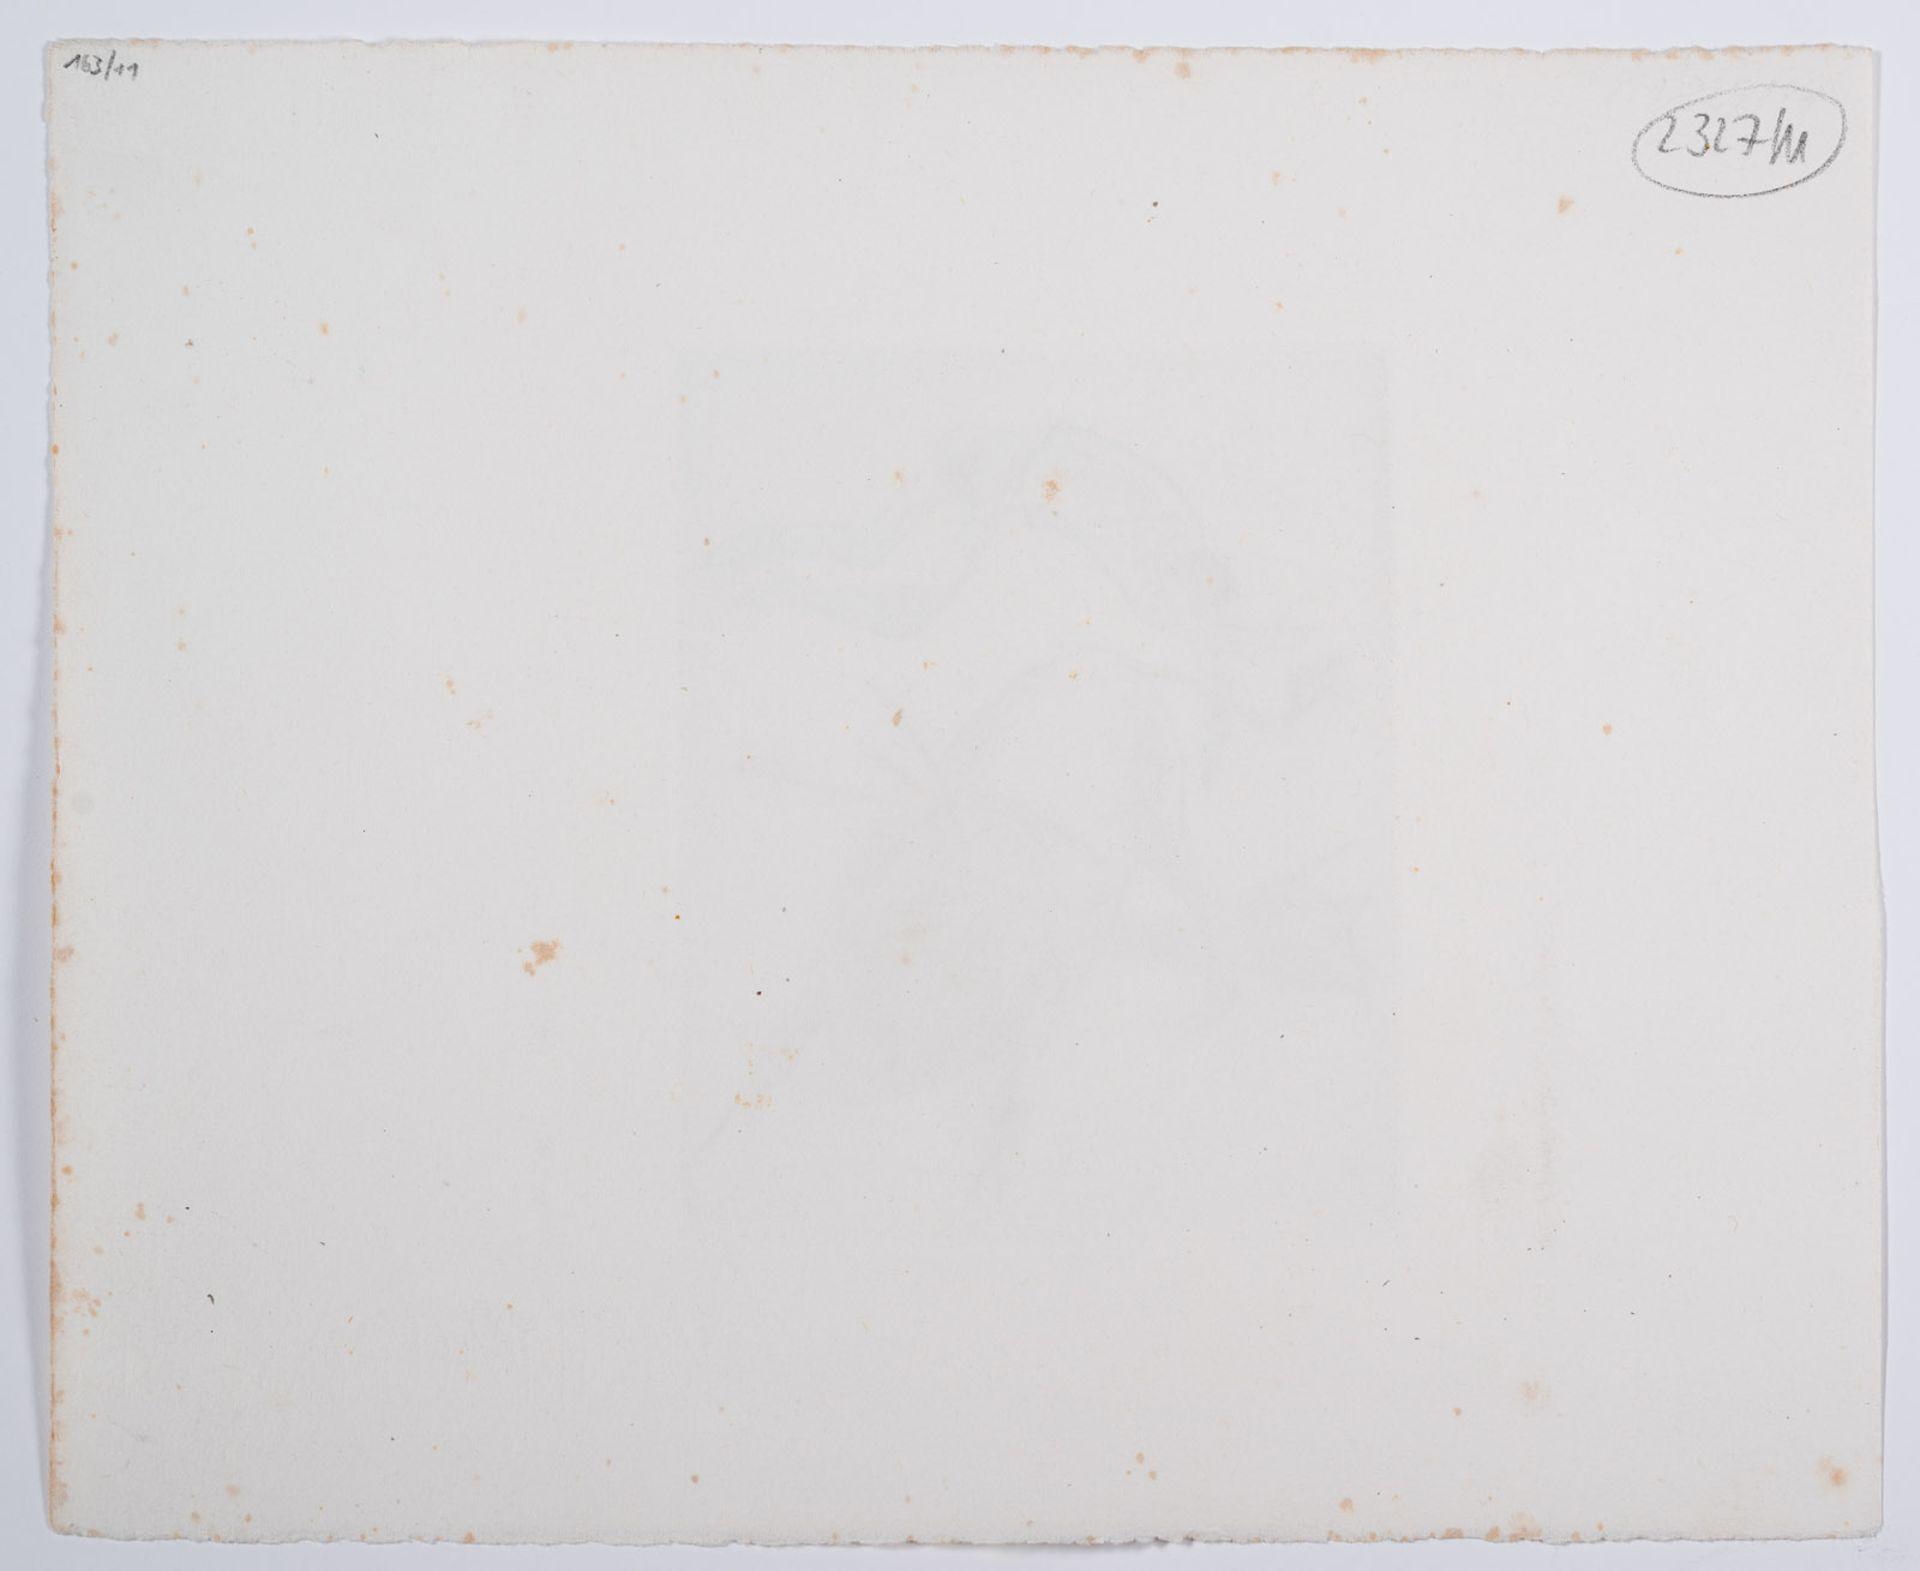 Geiger, Willi - Image 8 of 22